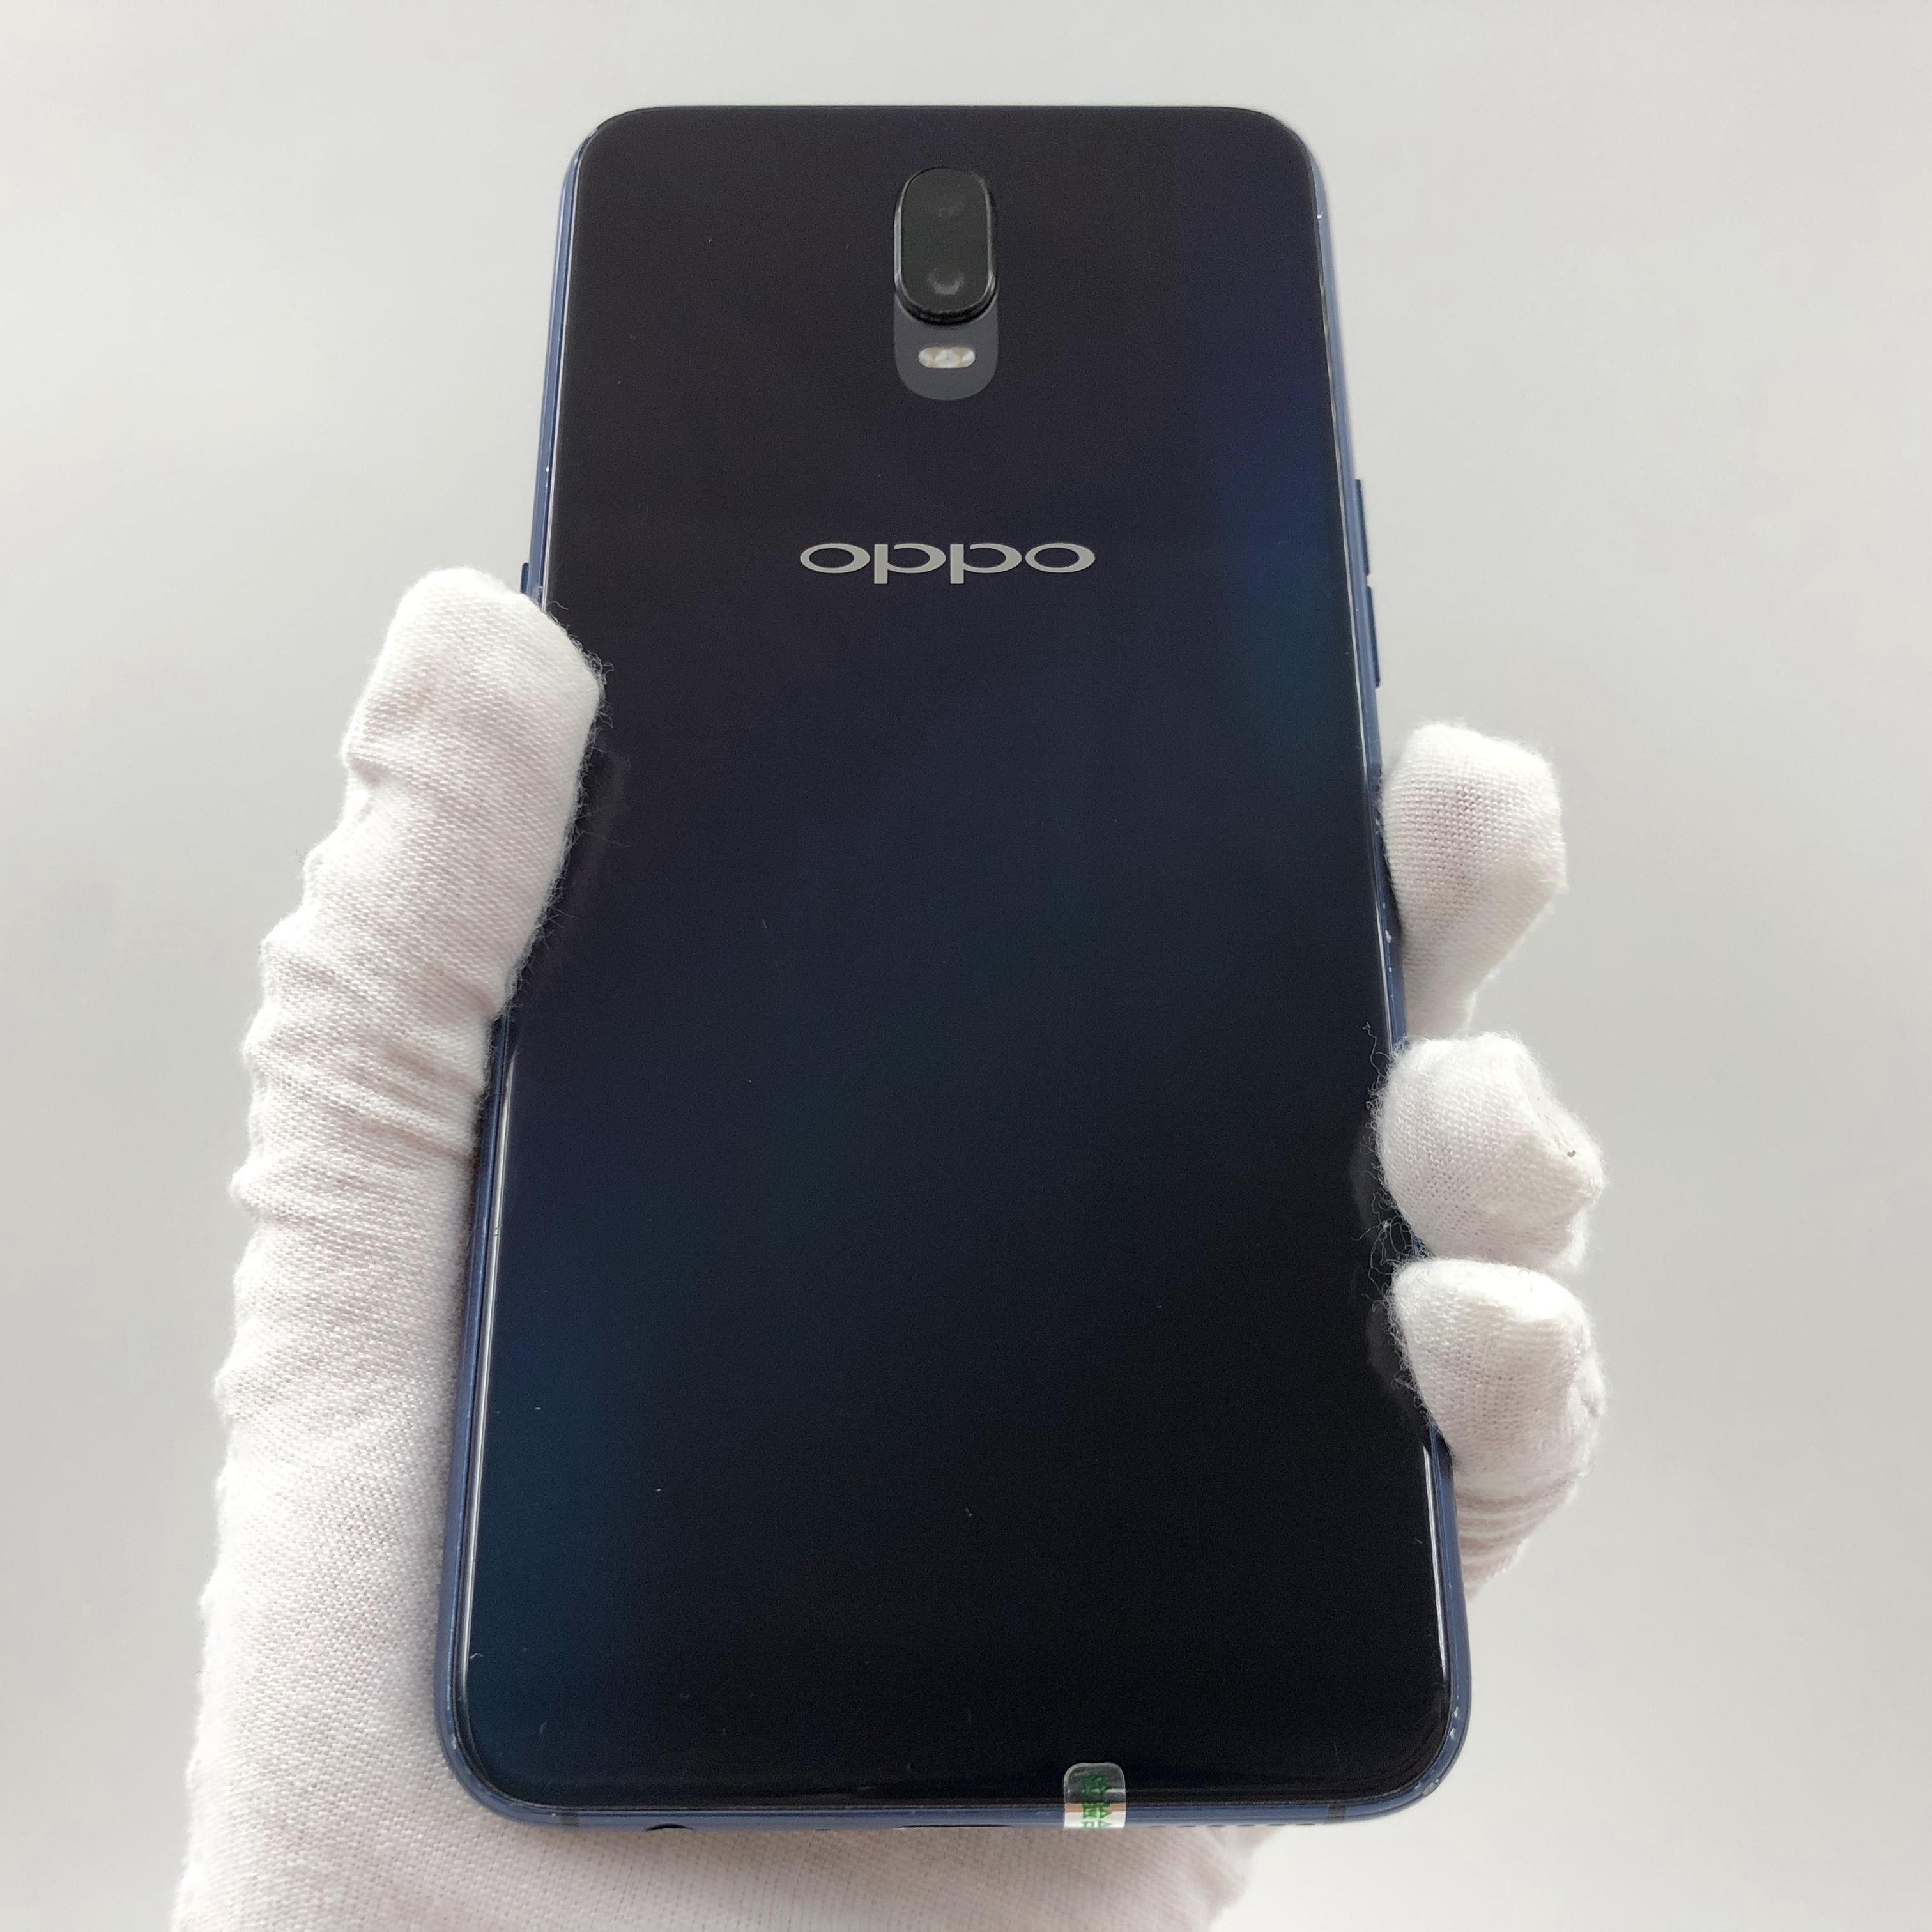 oppo【R17】4G全网通 蓝色 8G/128G 国行 9成新 真机实拍